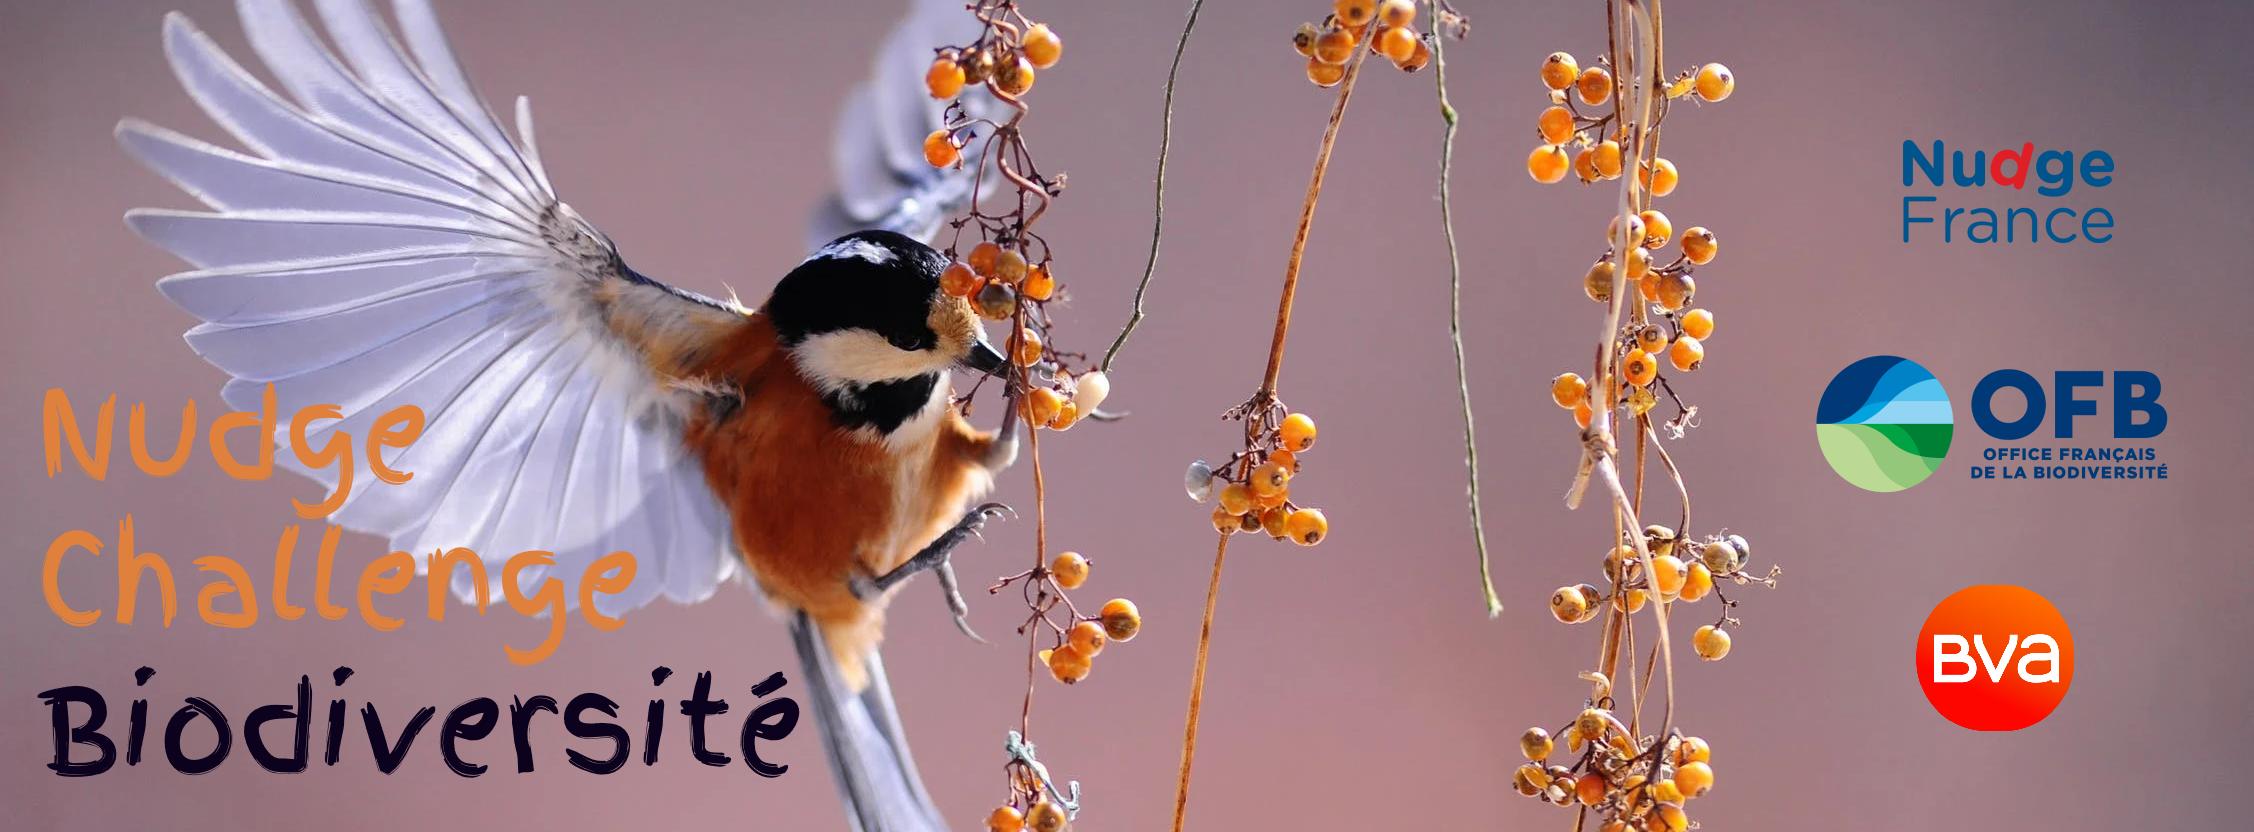 Image-nudge-challenge-biodiversité